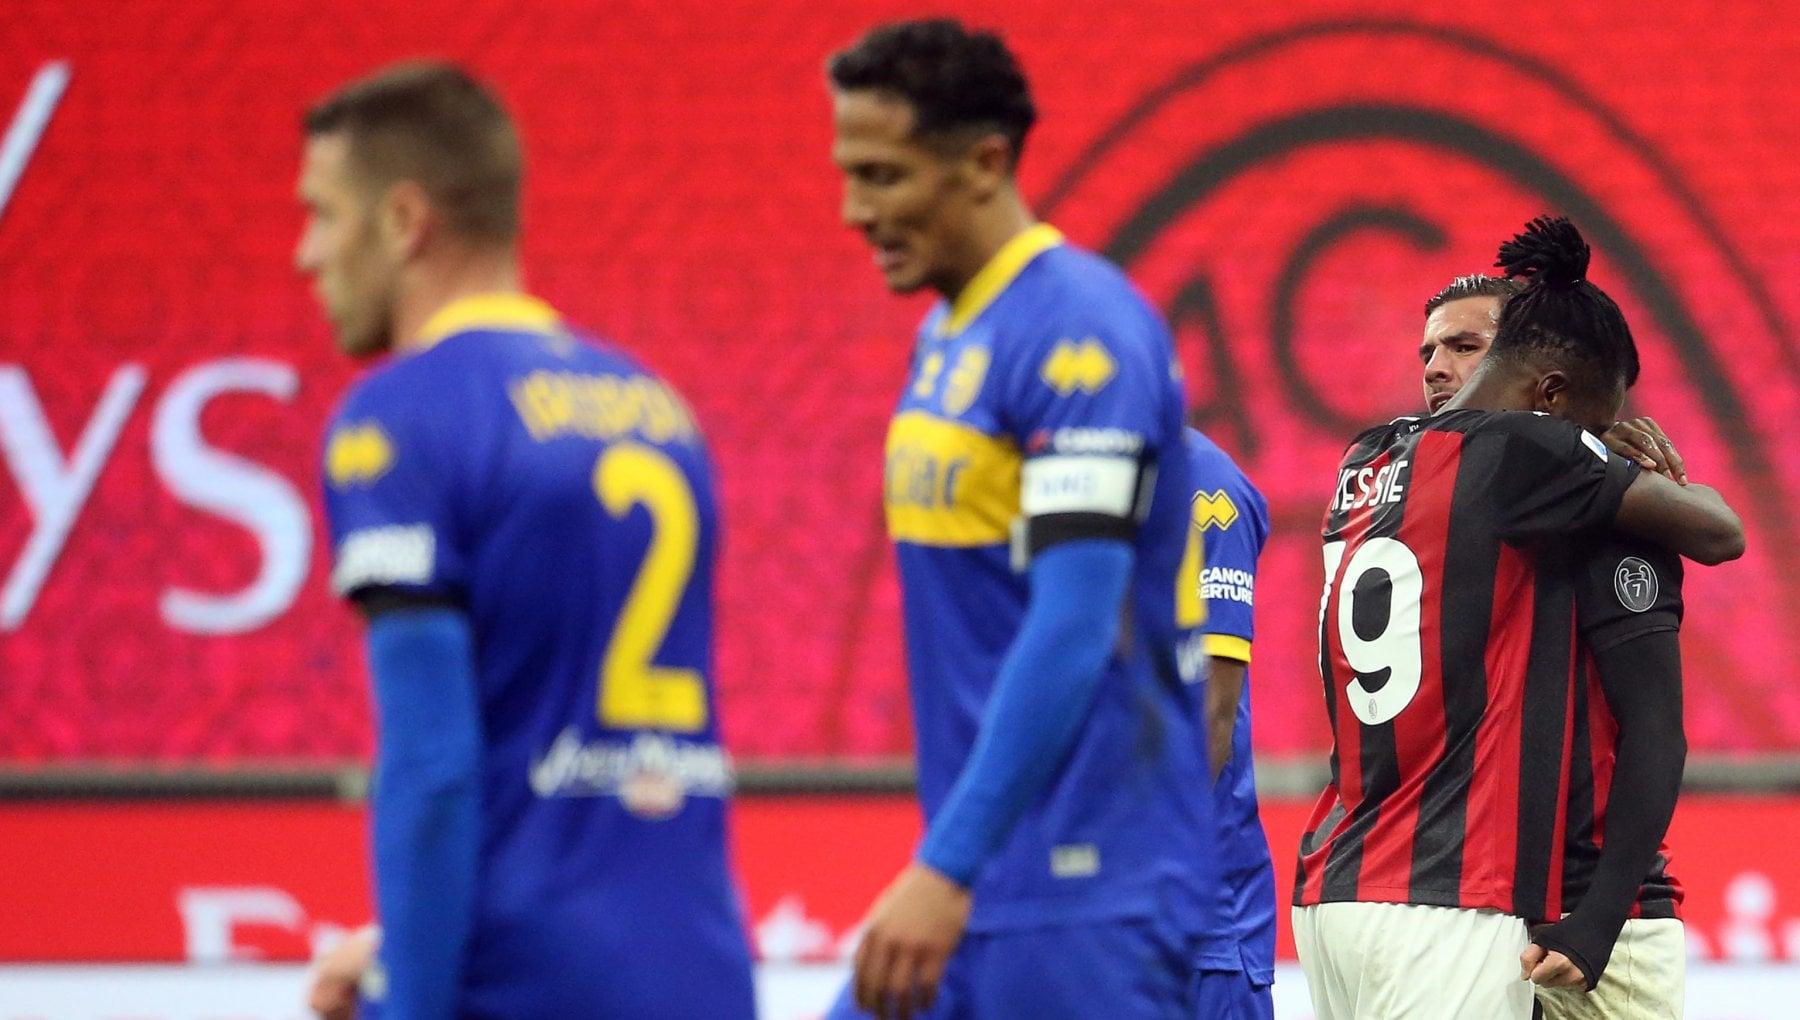 Milan Parma 2 2 Theo Hernandez al 91 salva i rossoneri